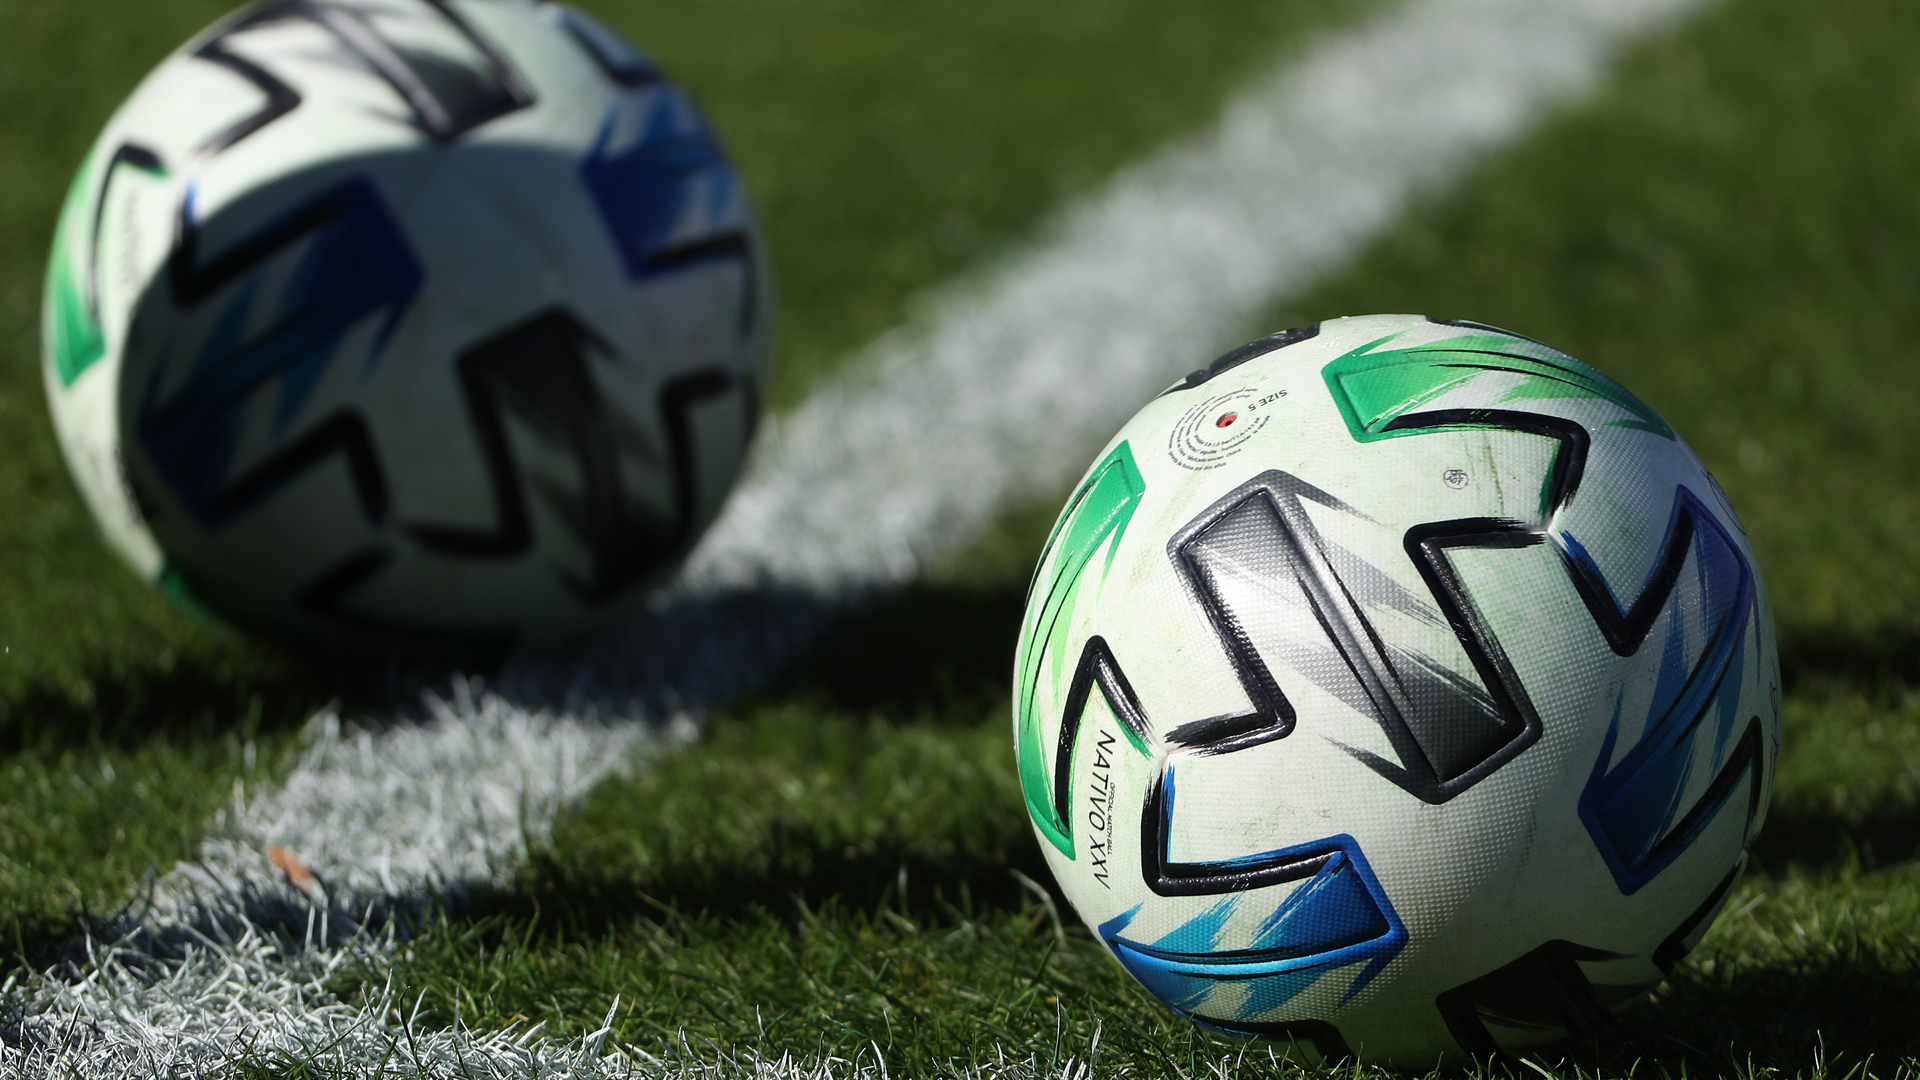 Philadelphia Union player becomes MLS' first positive coronavirus test